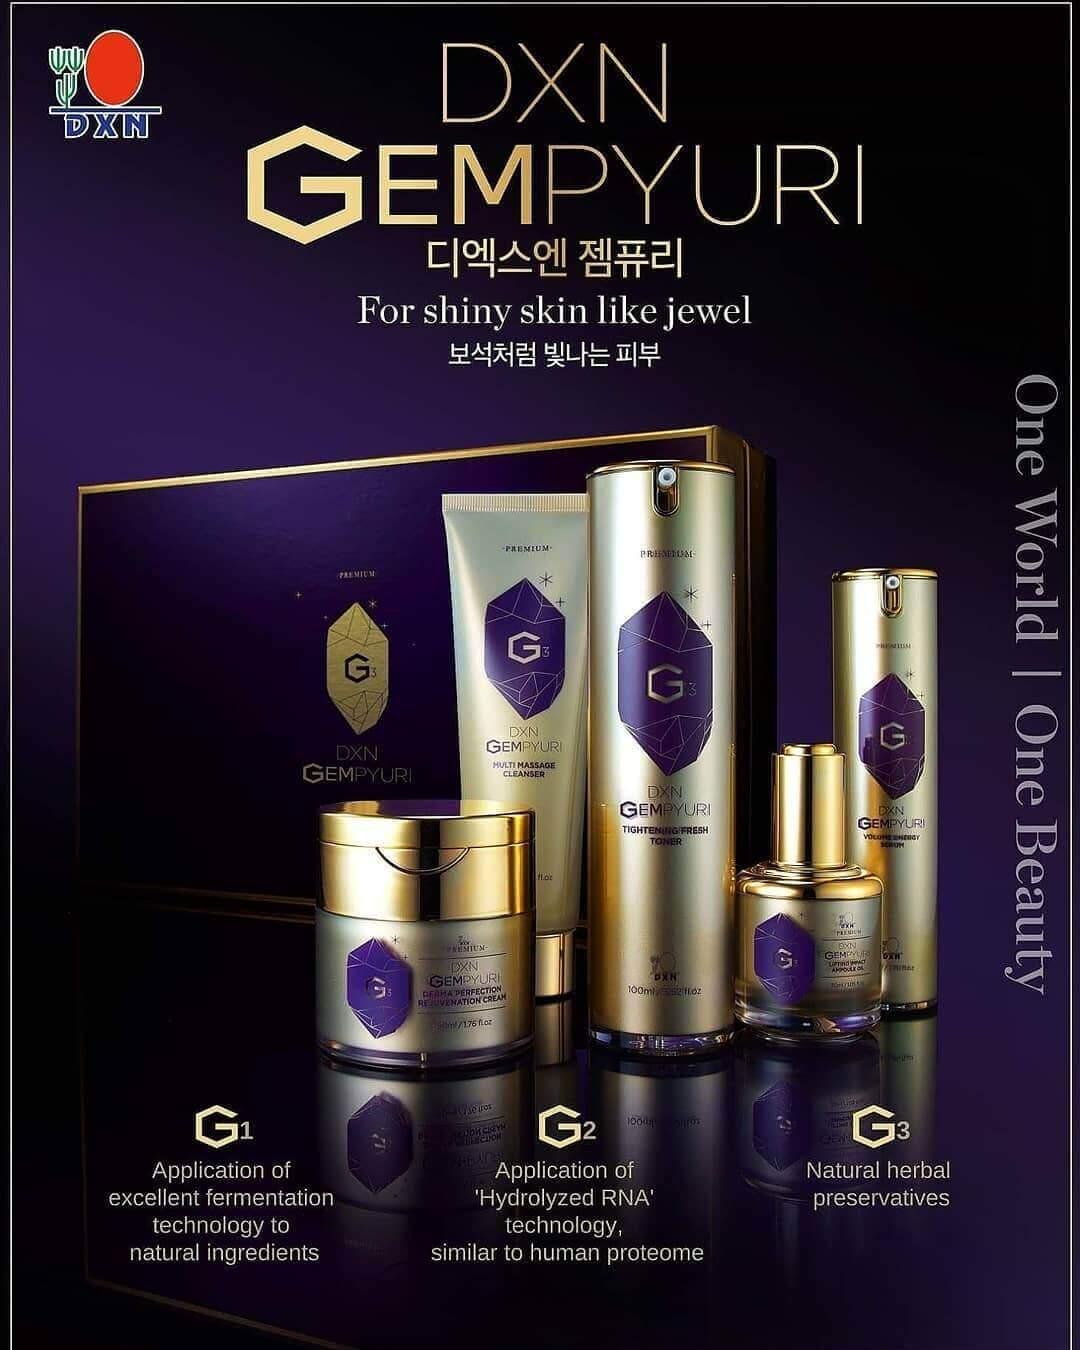 DXN Beauty – Die neue Kosmetik Produktfamilien